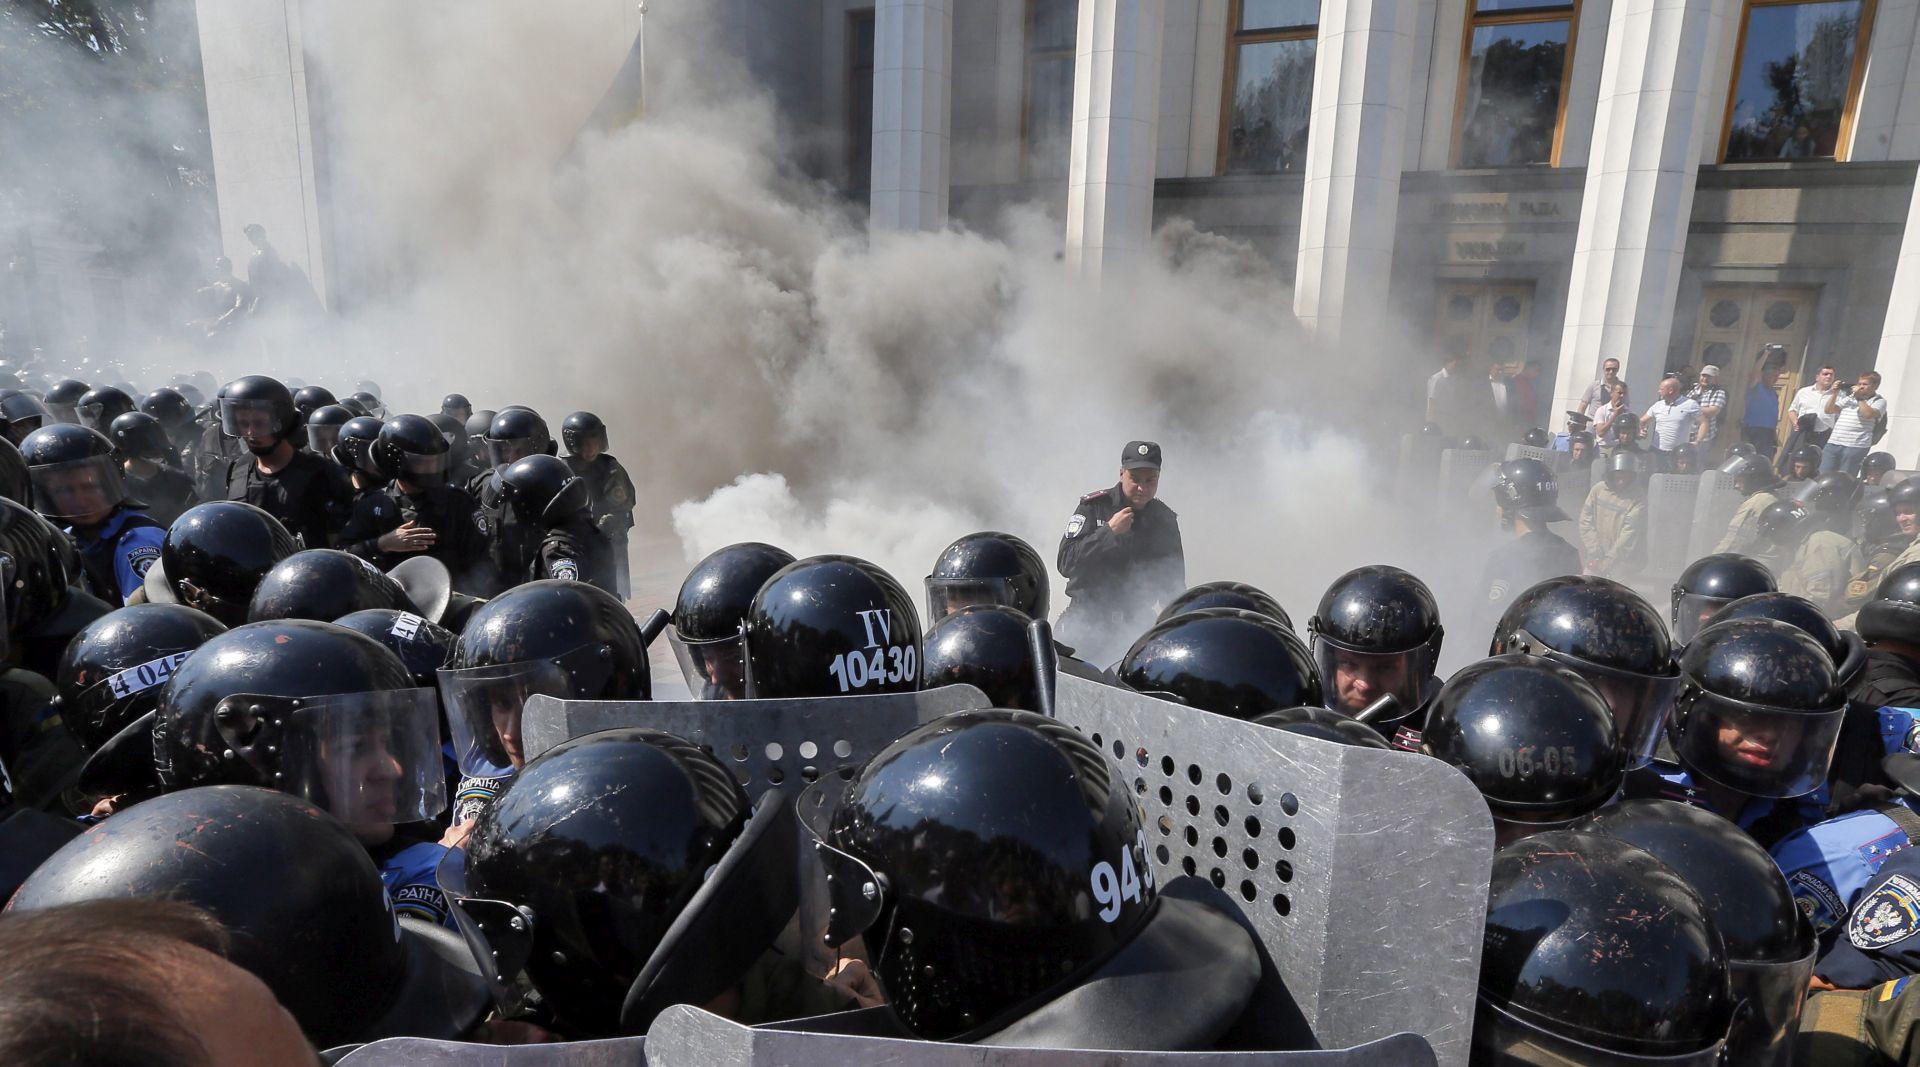 VIDEO: U sukobu u Kijevu poginuo gardist, 90 policajaca ranjeno